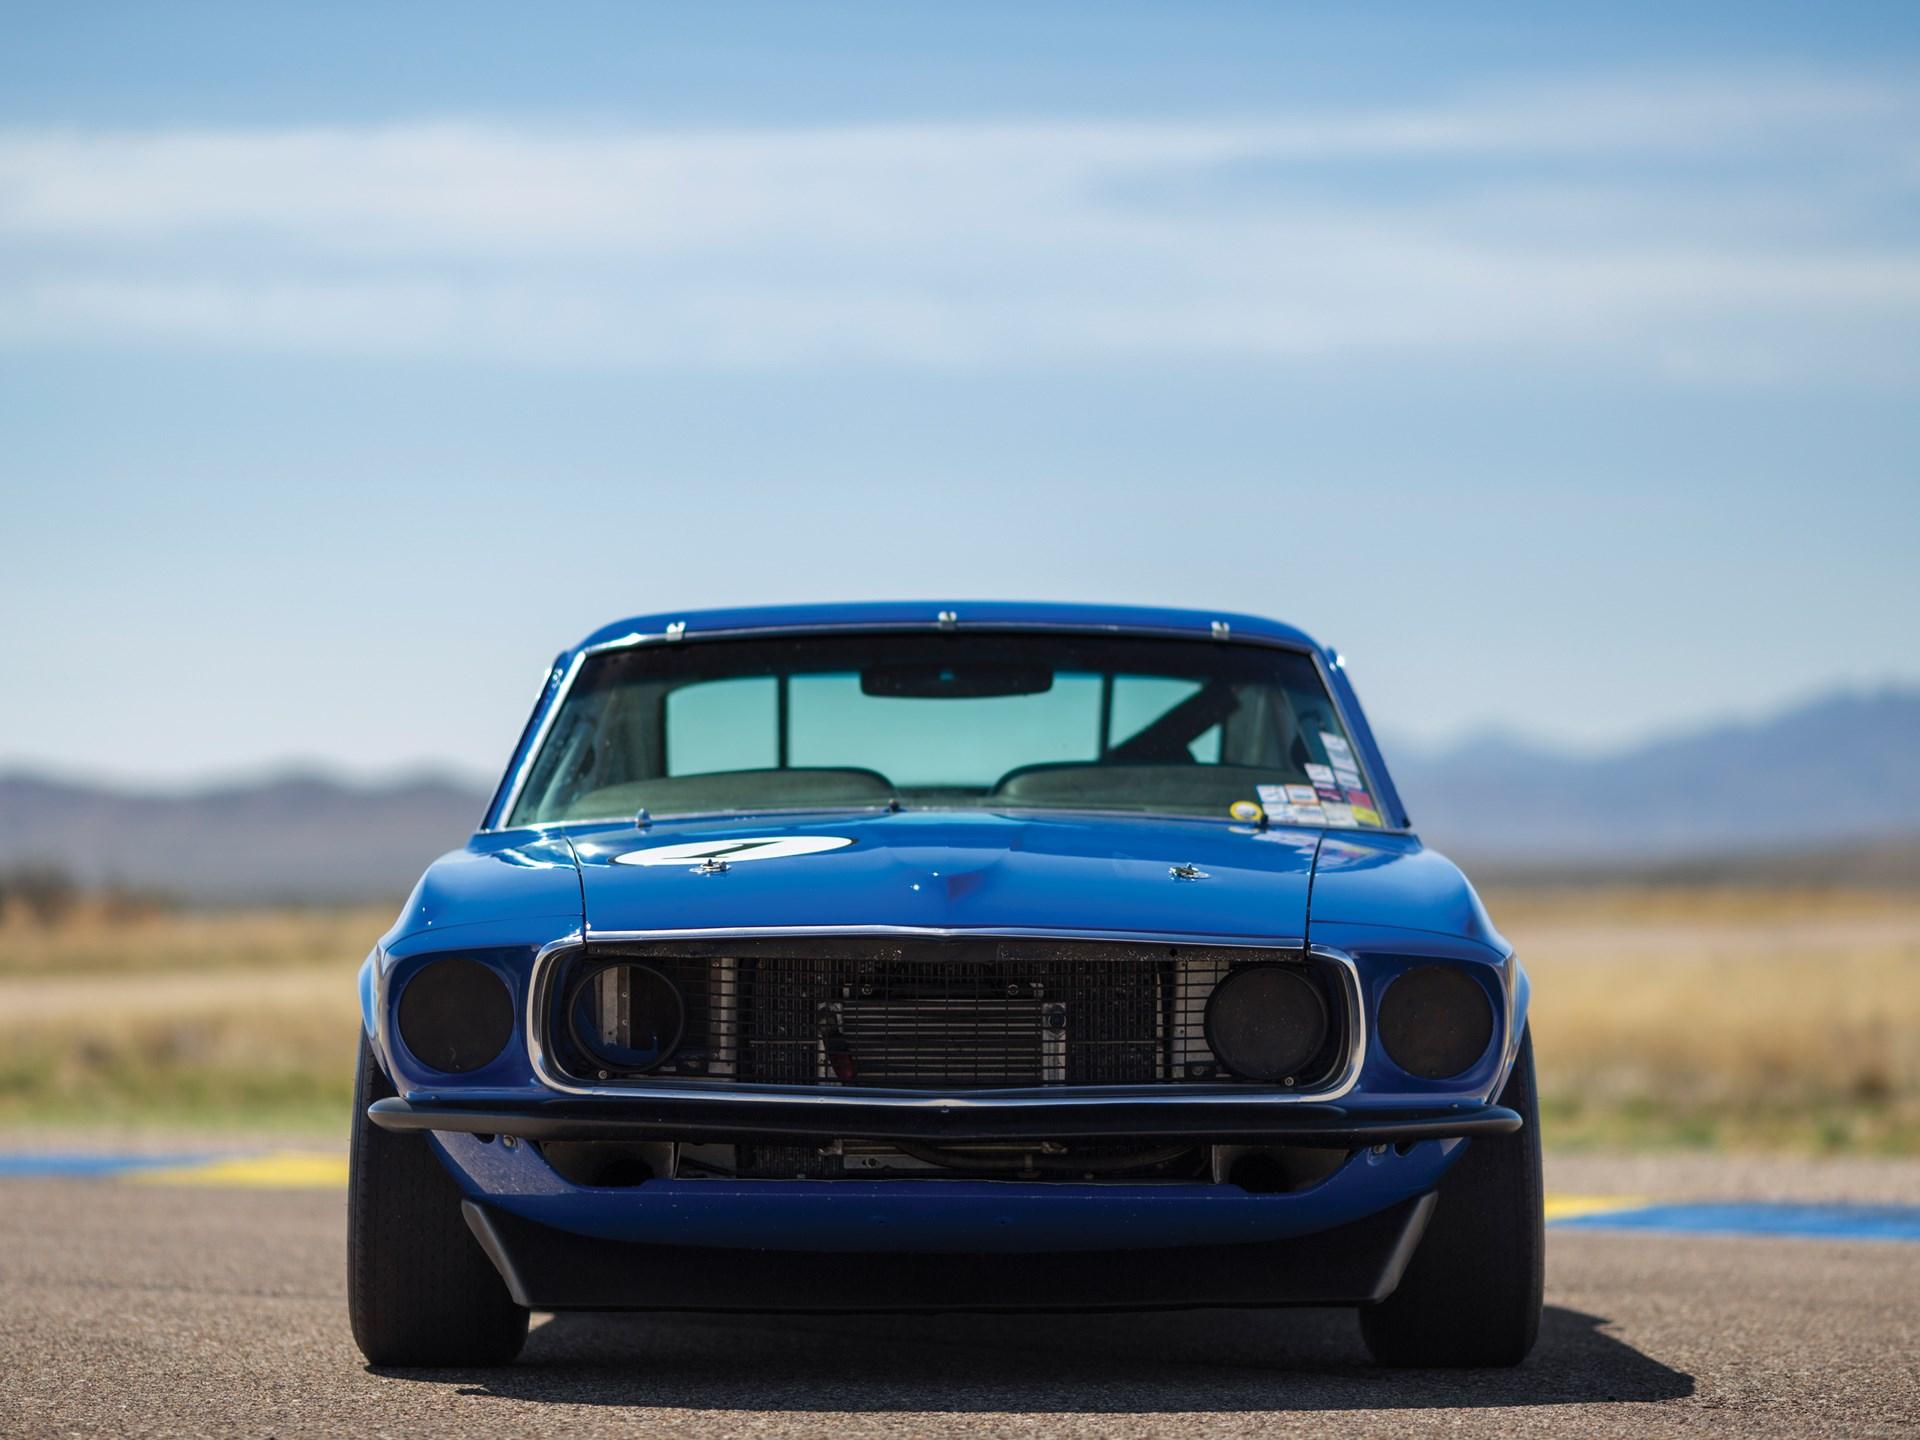 1969 Ford Mustang Boss 302 Trans Am